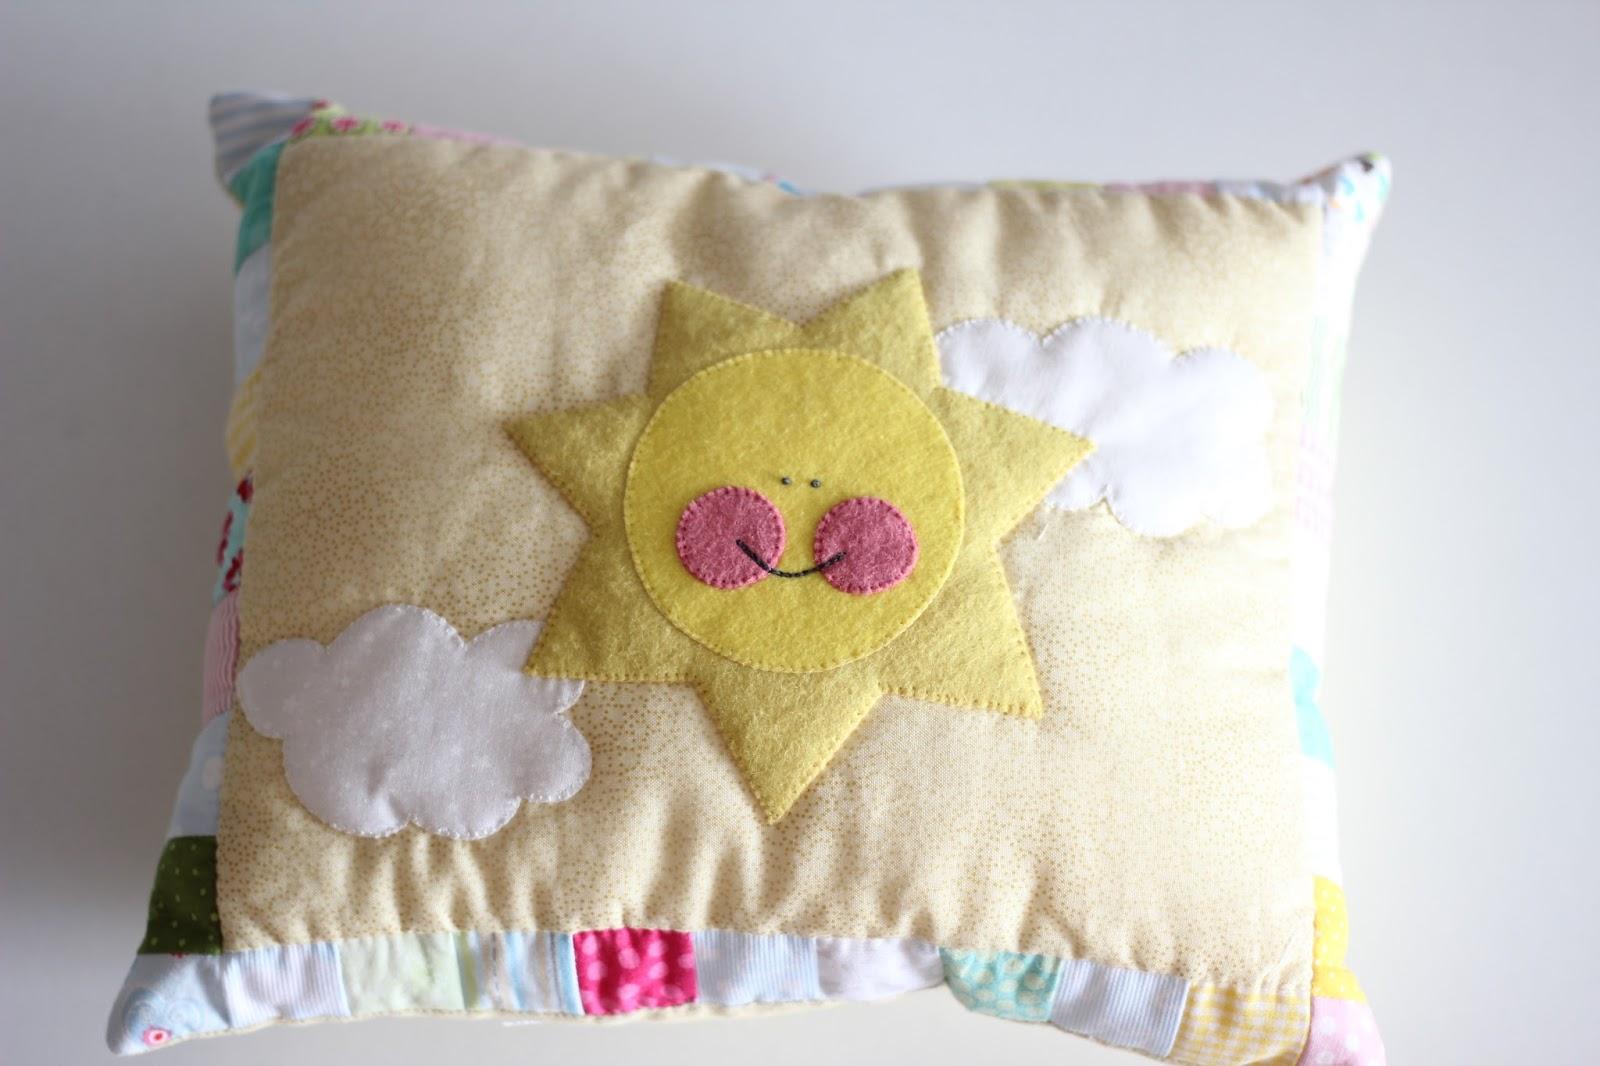 Cojines infantiles con patchwork cojines infantiles con - Cojines de patchwork ...